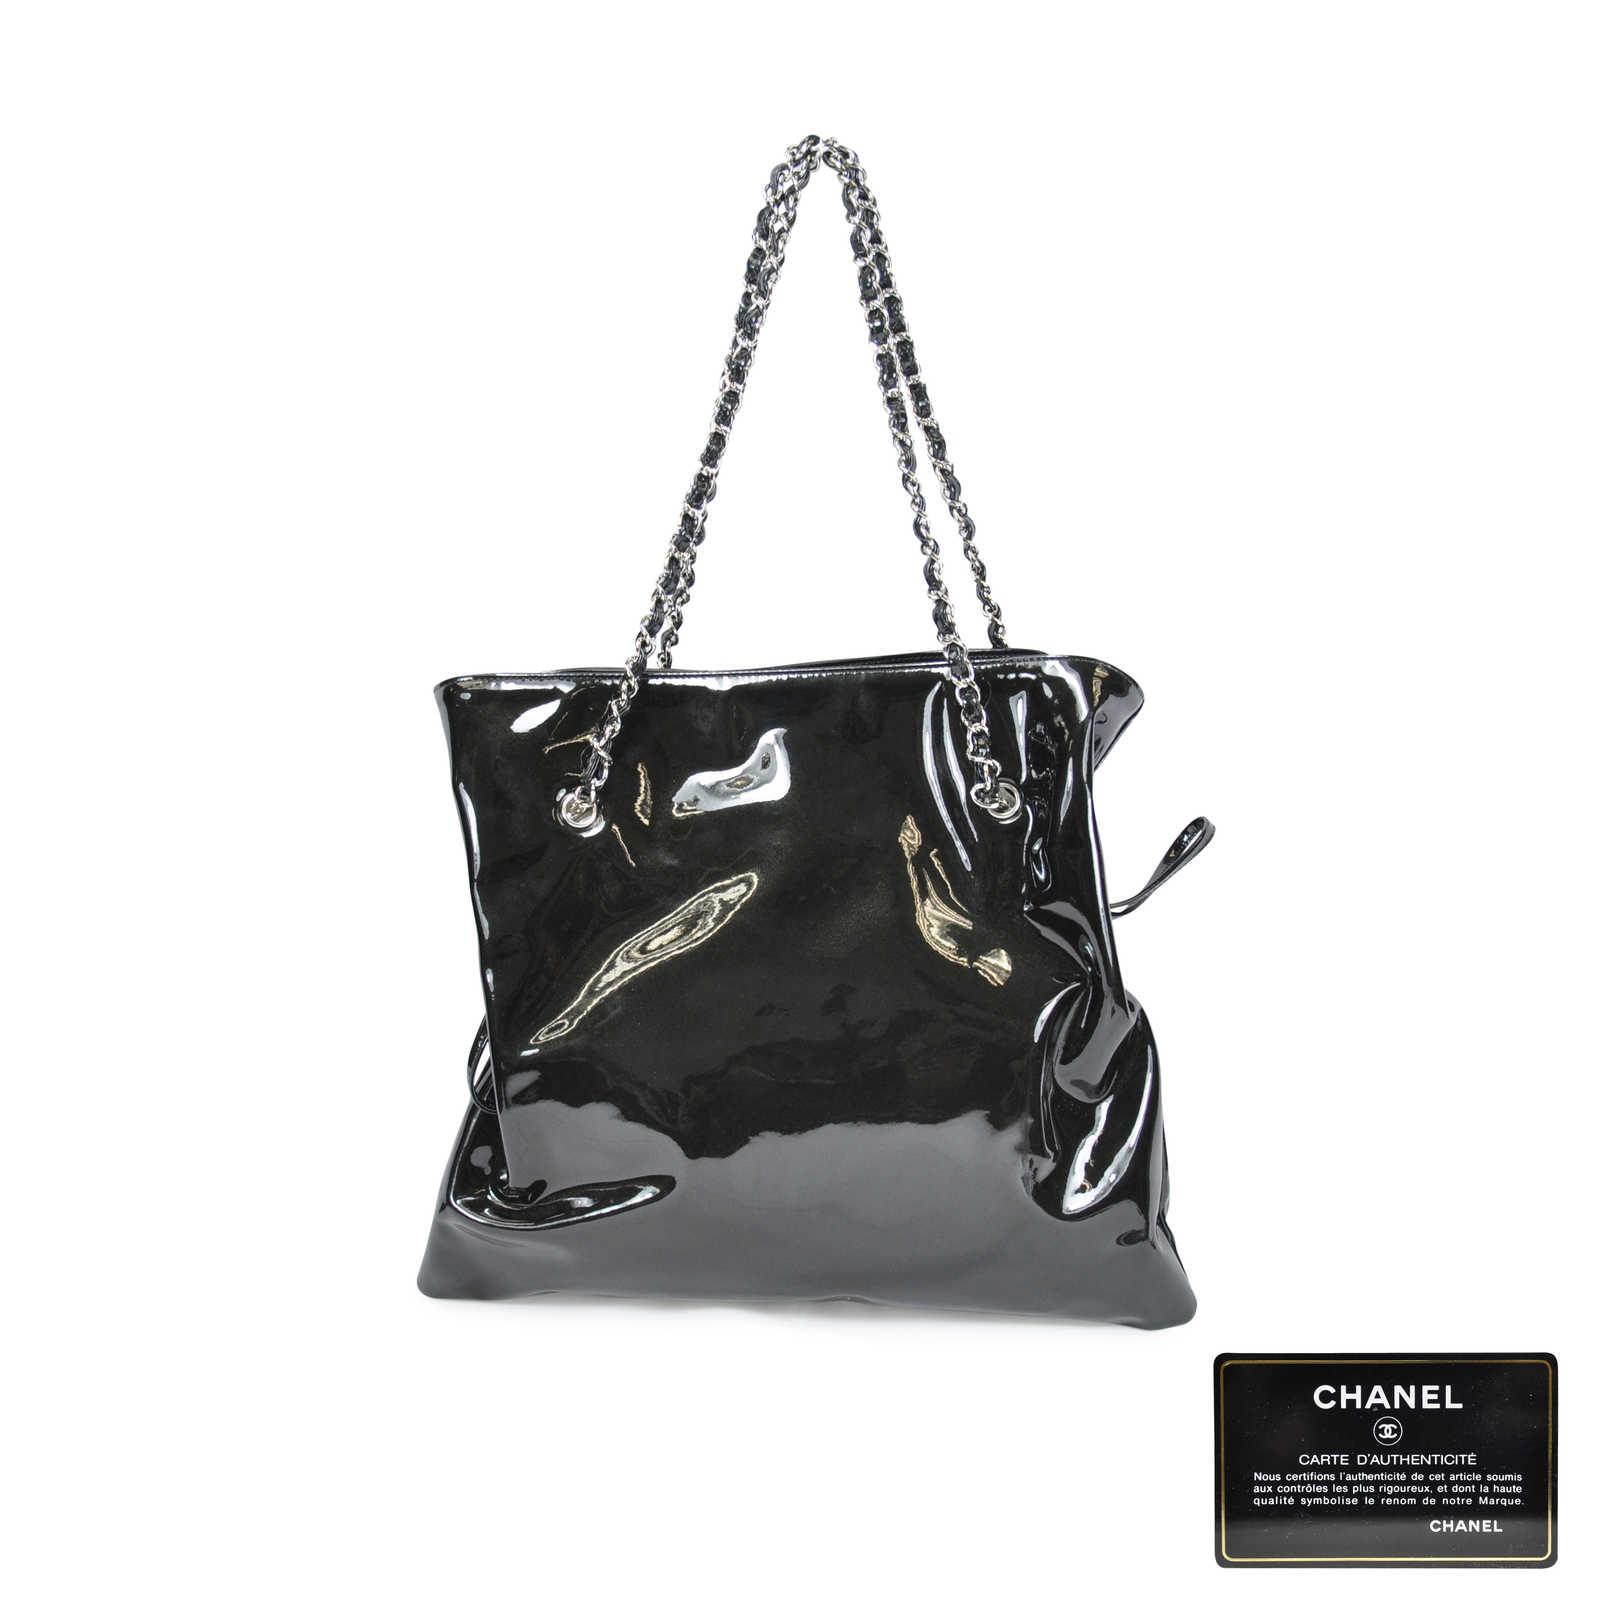 8b06bbd910f7 ... Authentic Second Hand Chanel Patent Lambskin Bon Bon Tote Bag  (PSS-062-00007 ...